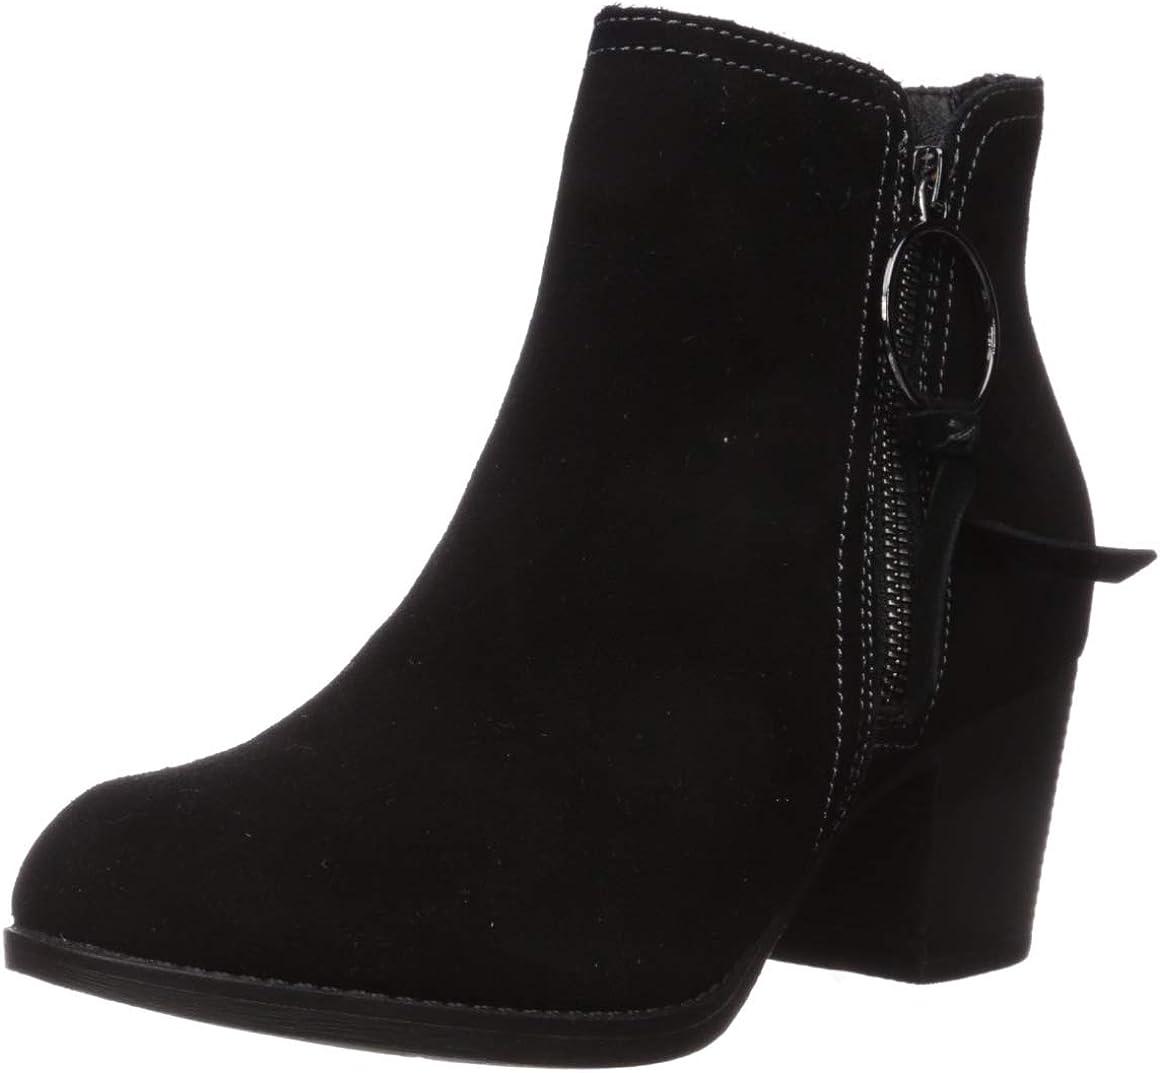 Skechers Women's Taxi-Single Ladies-Wearable Comfort Short Zipper Ankle Boot